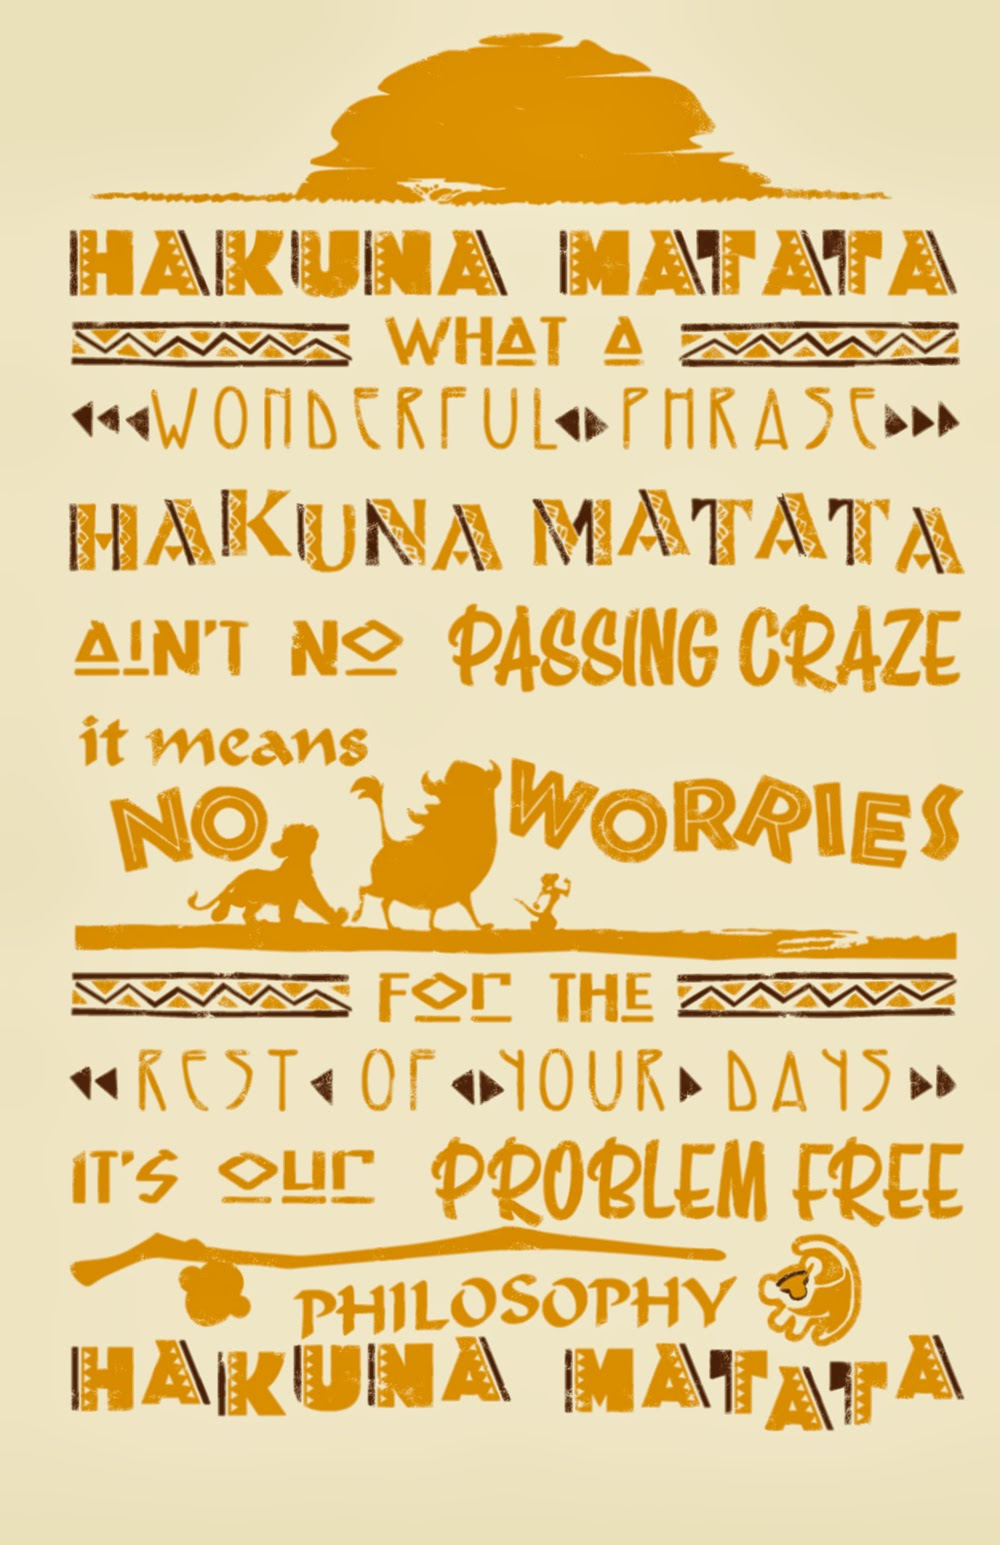 Katersbonneville lion king threadless shirt design - Signification hakuna matata ...